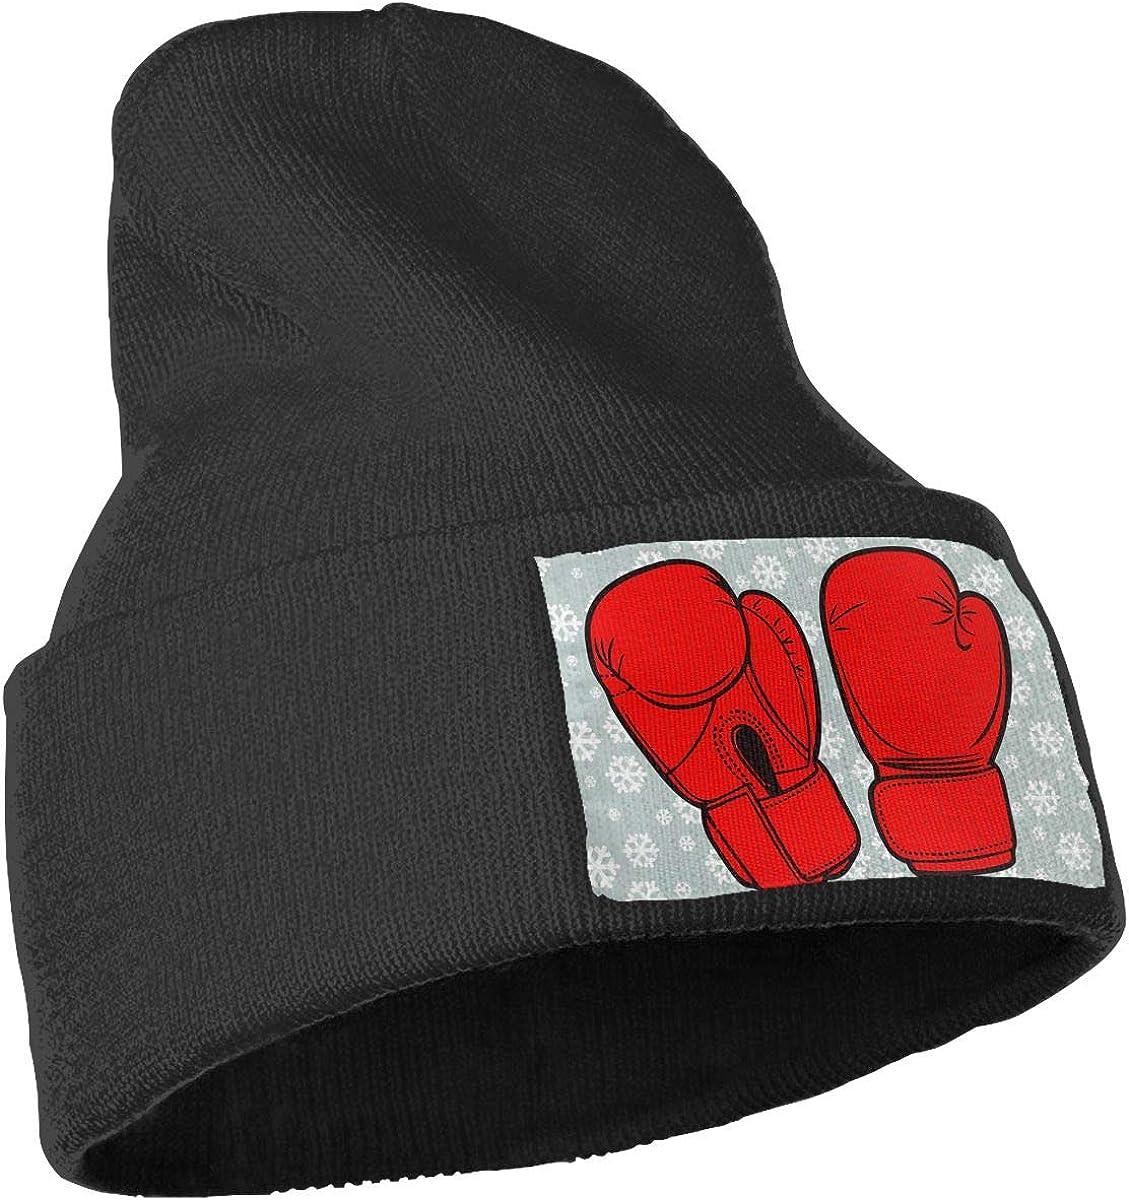 I Love Boxing Men Women Knitting Wool Warm Running Beanie Hats